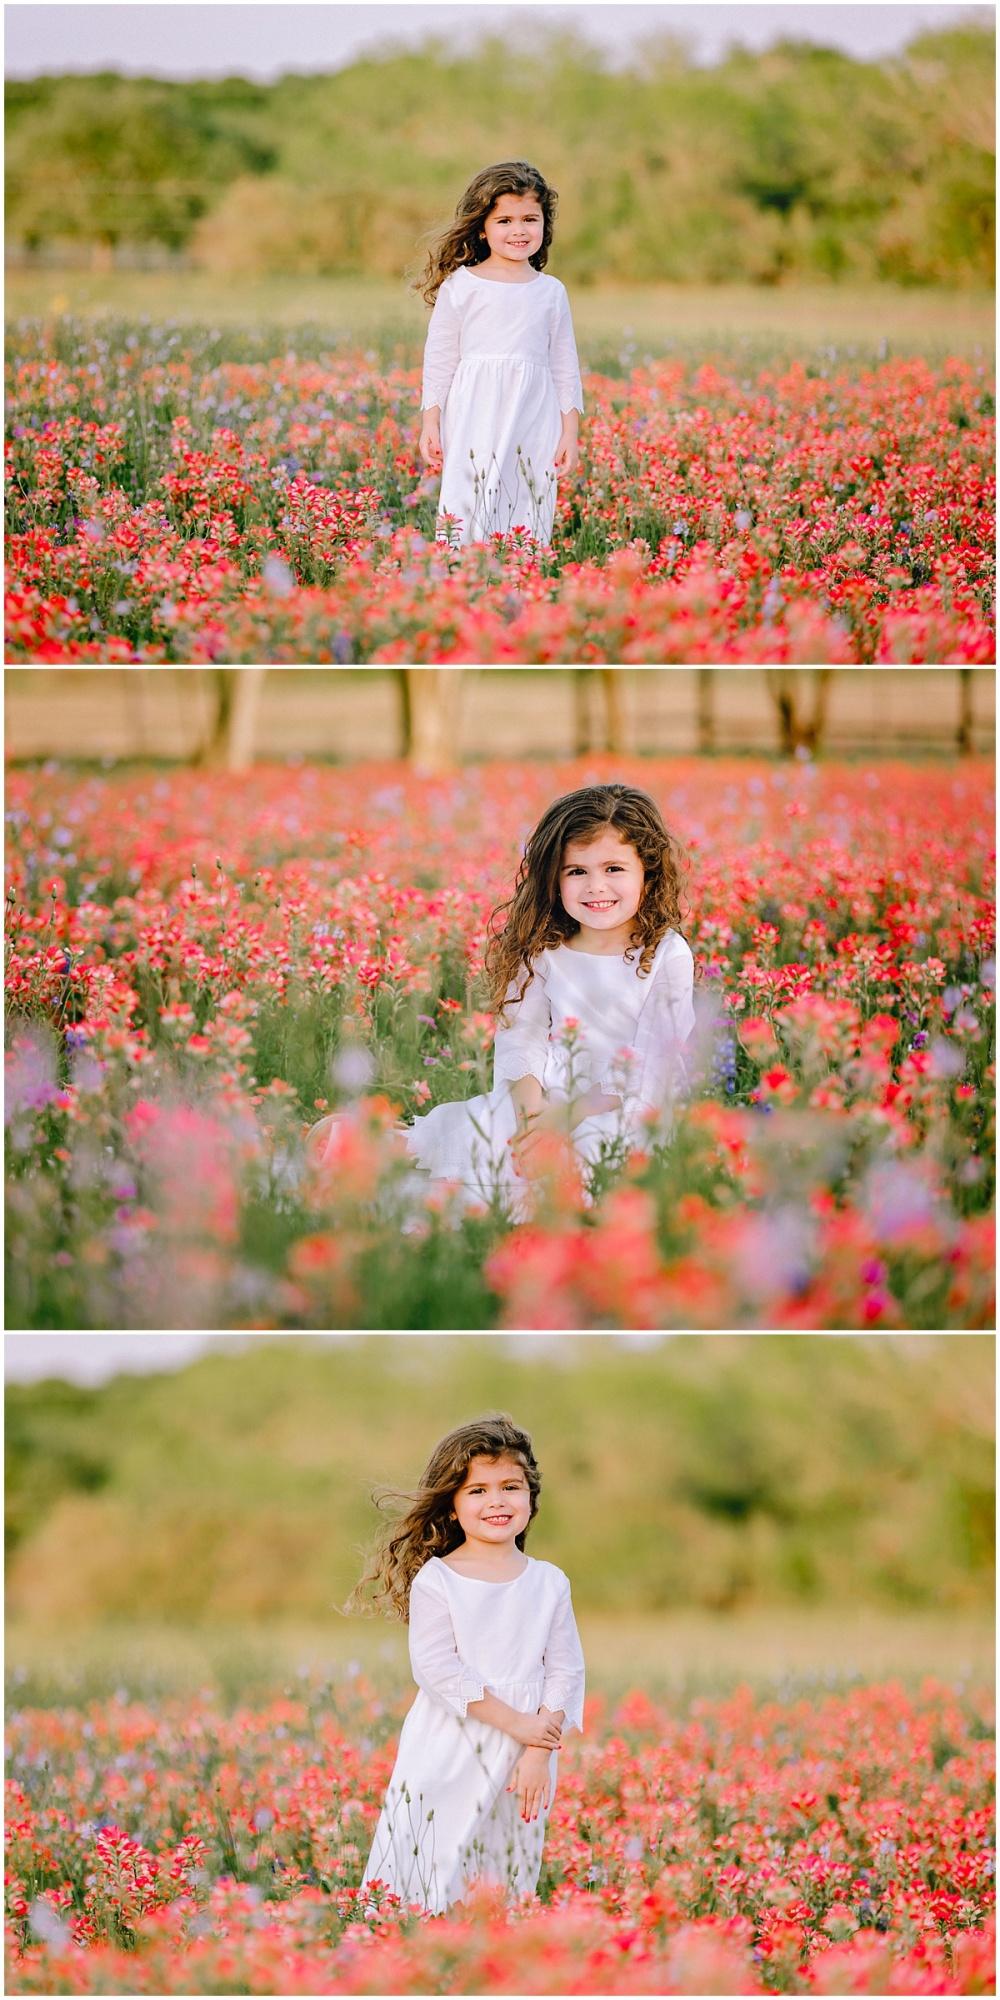 Wildflowers-Texas-Bluebonnets-Spring-Birthday-Photo-Session-Kids-Carly-Barton-Photography_0001.jpg